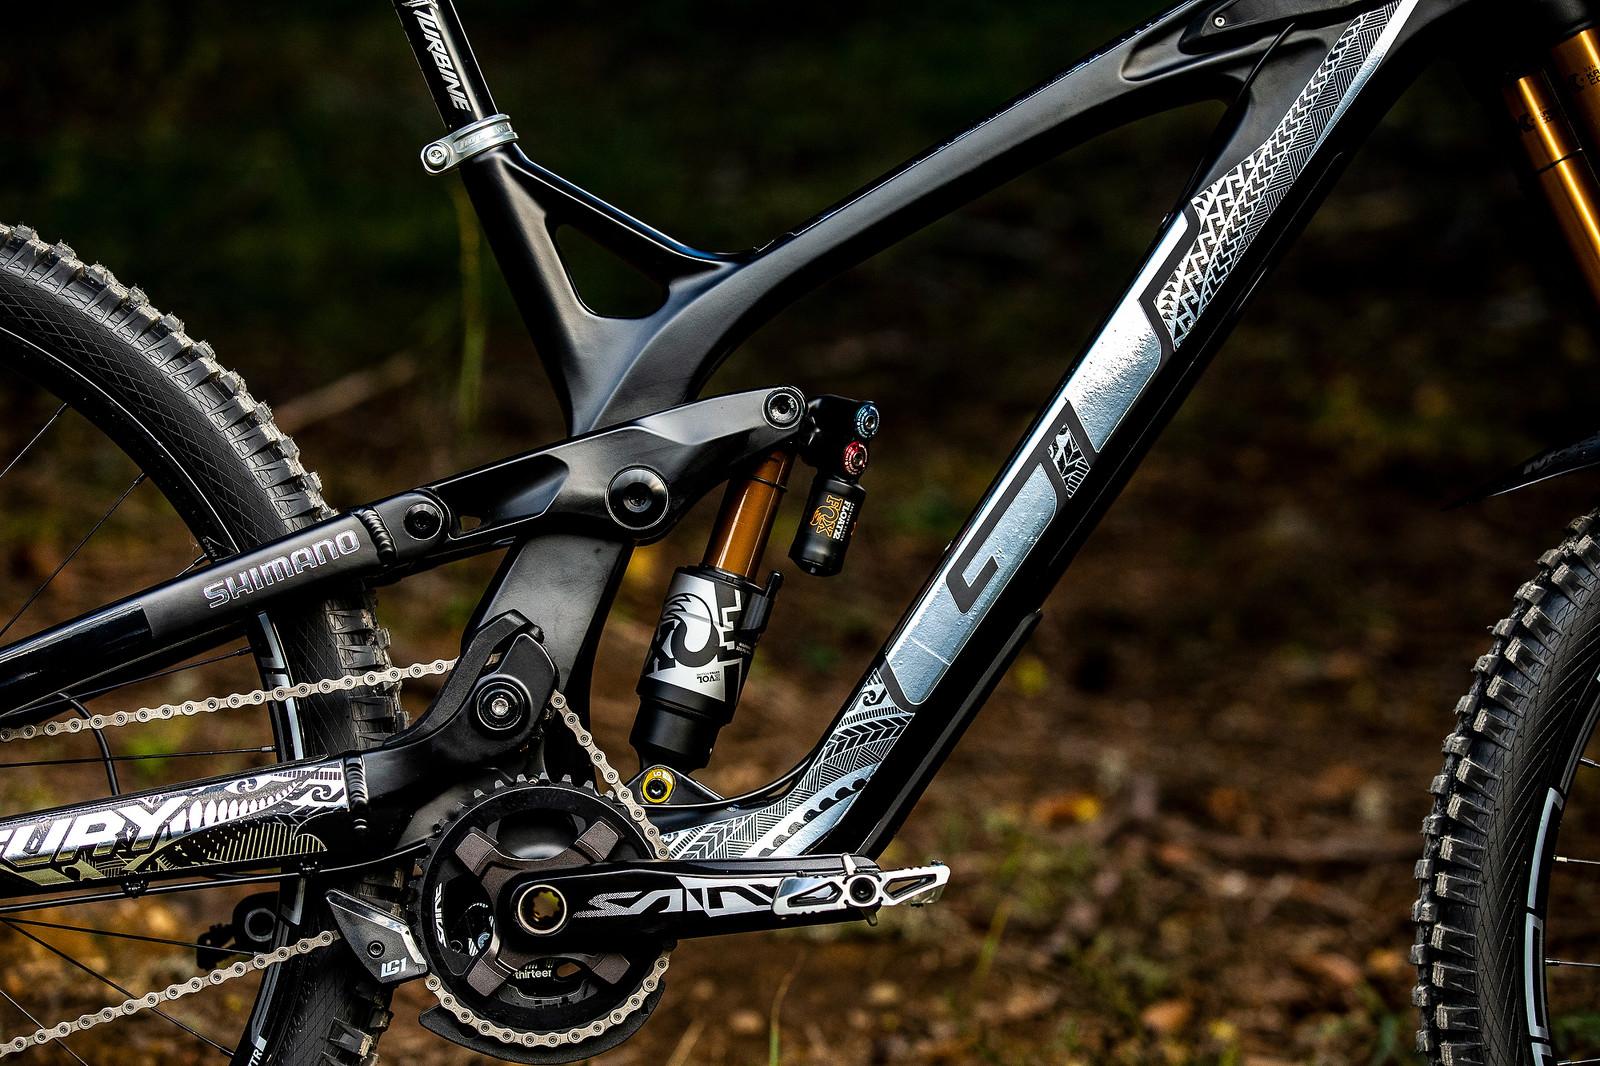 High-Idler Love - WORLD CHAMPS BIKE - Wyn Masters' GT Fury - Mountain Biking Pictures - Vital MTB